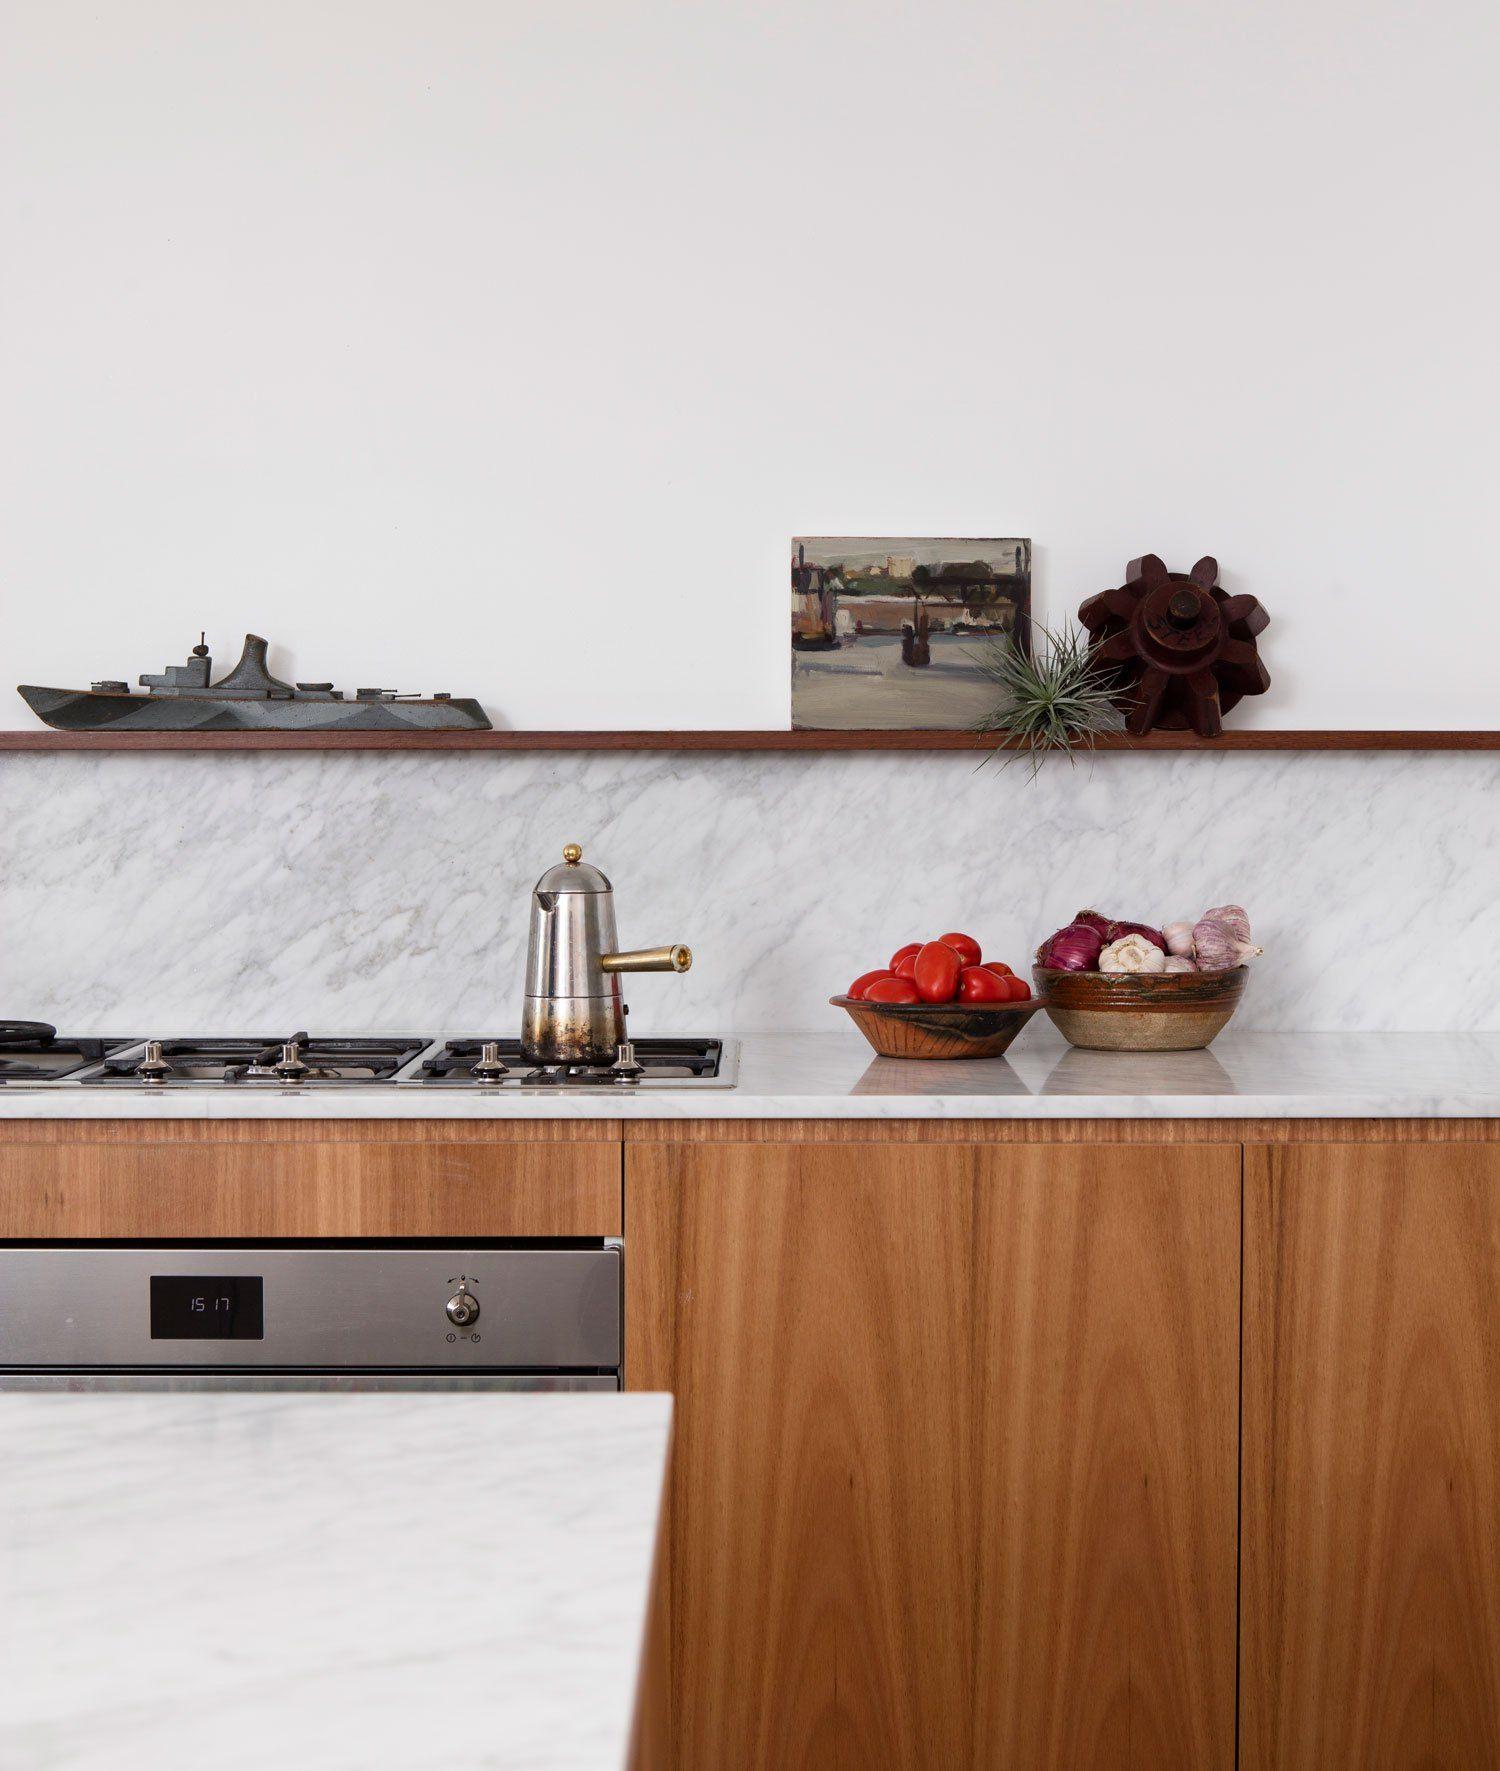 Erfreut Küchenschrank Maler Sydney Ideen - Küche Set Ideen ...